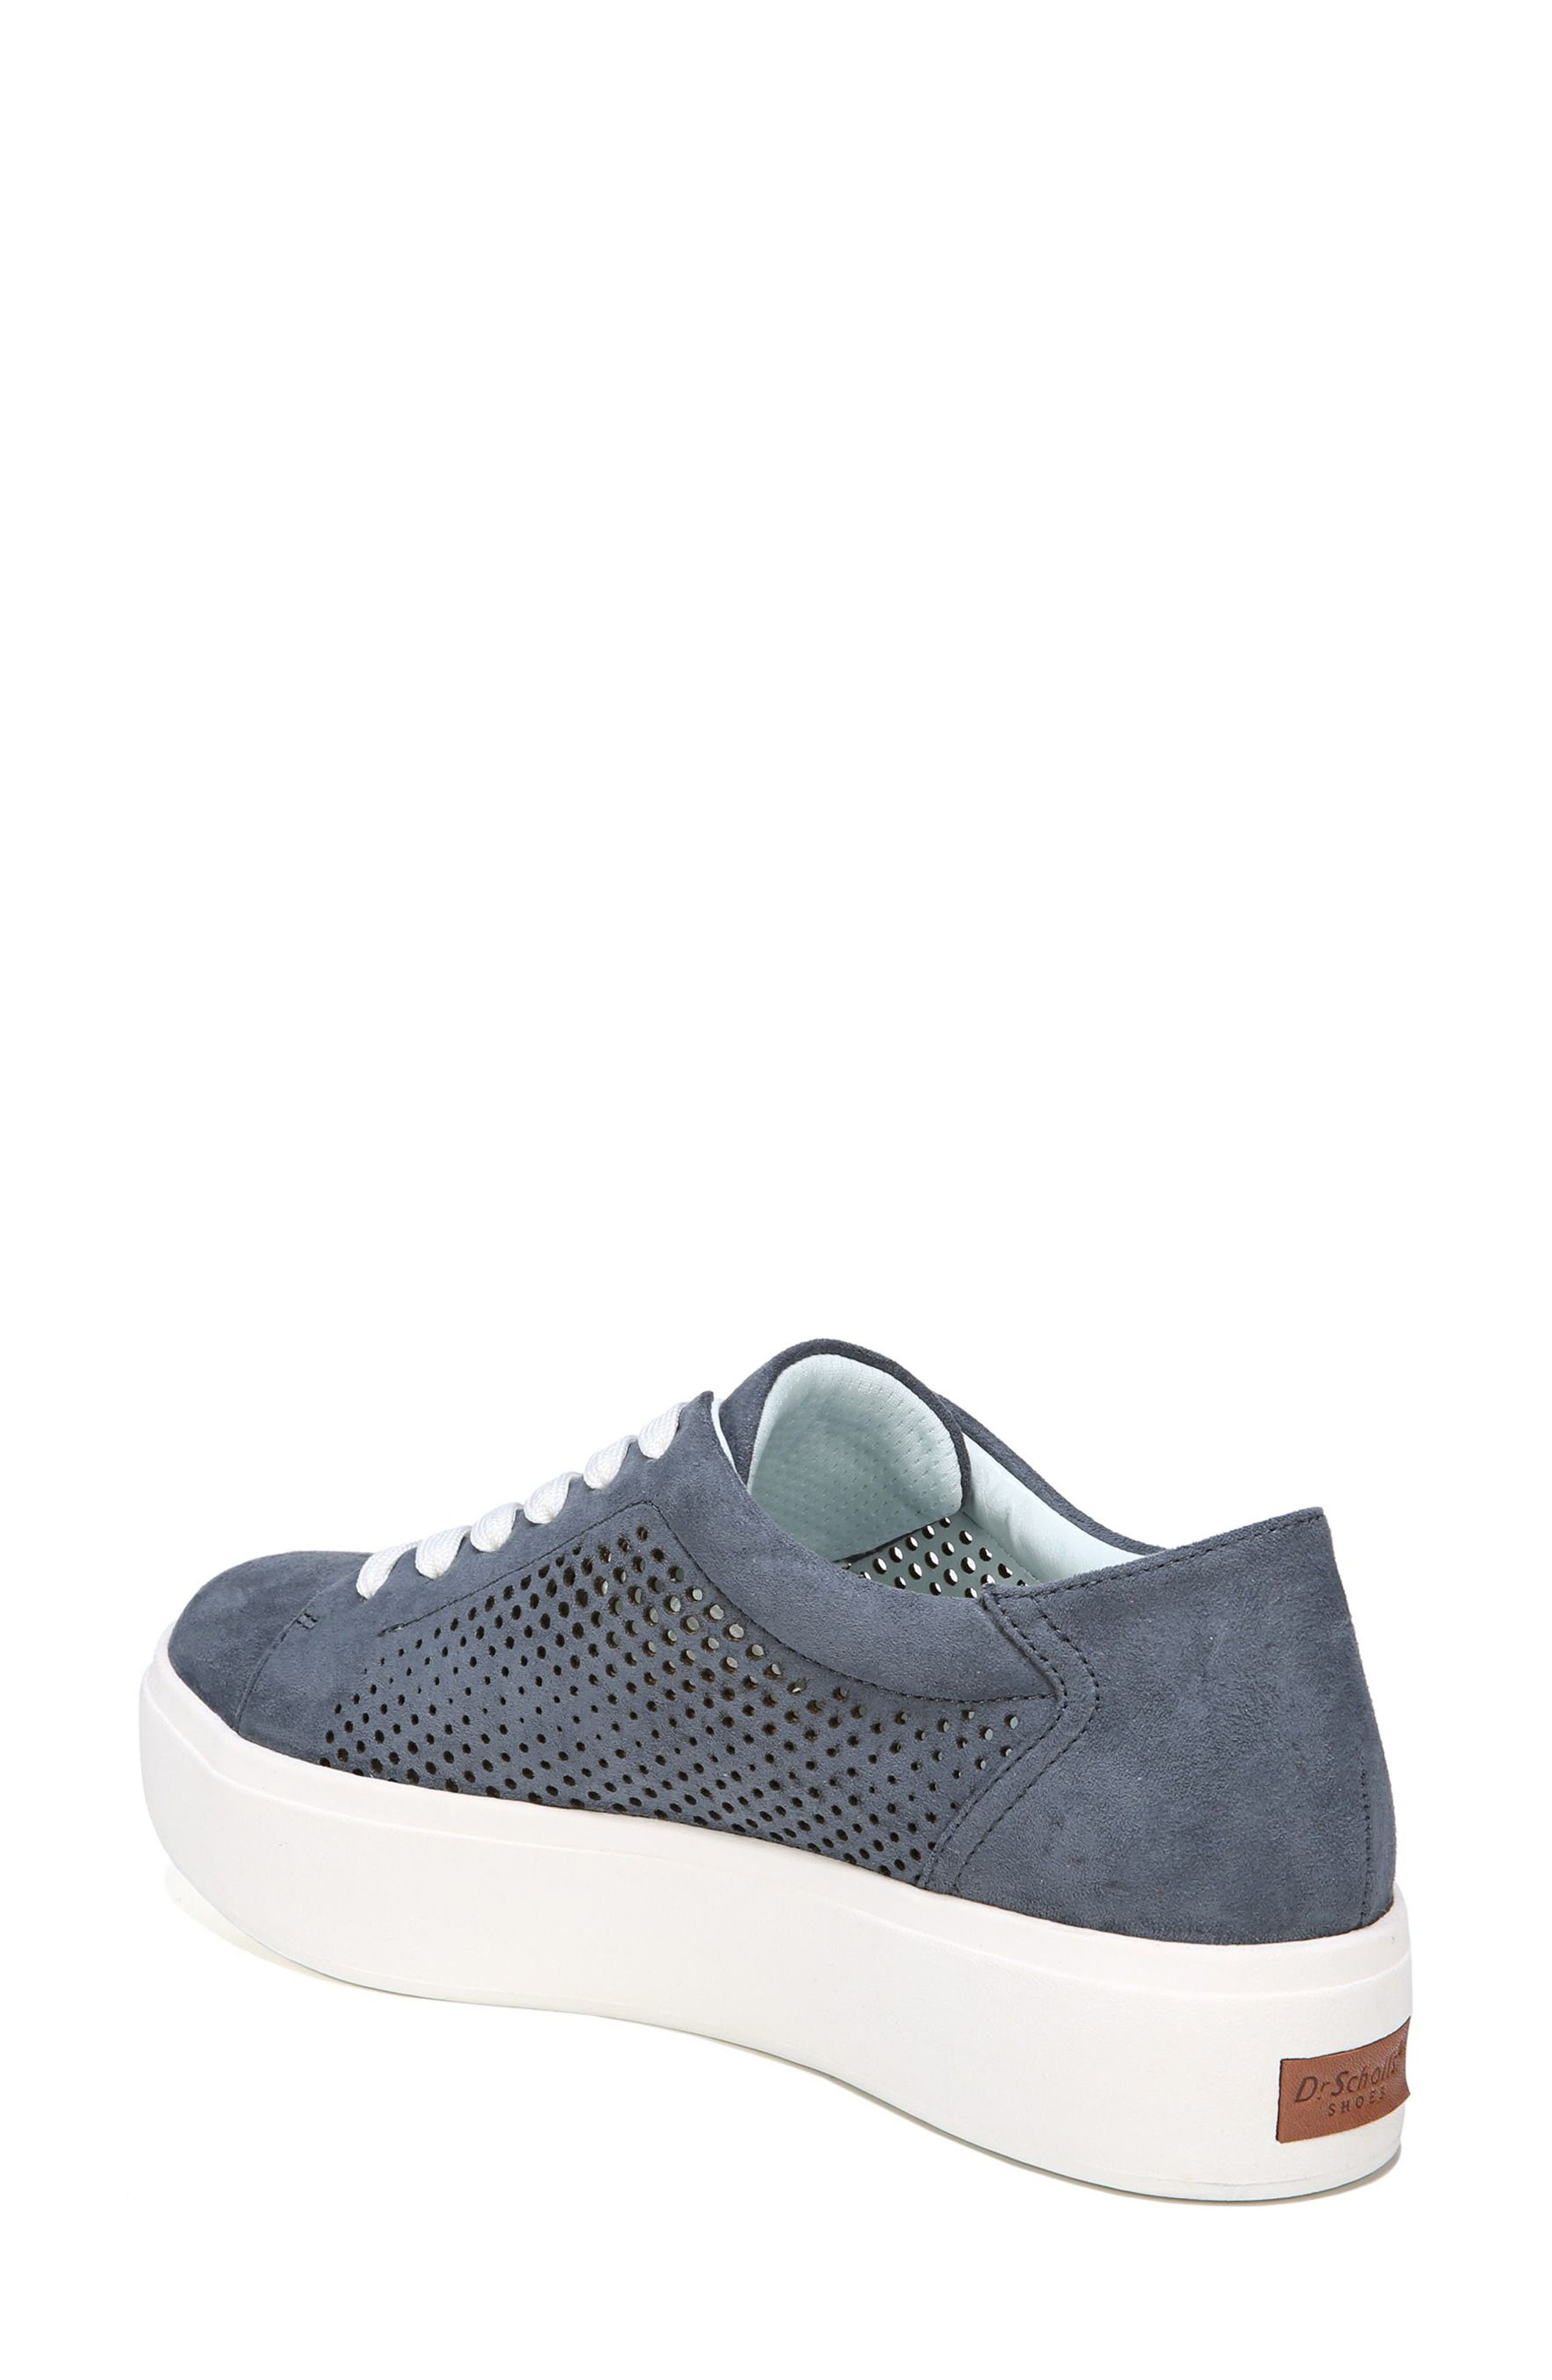 Alternate Image 2  - Dr. Scholl's Kinney Platform Sneaker (Women)